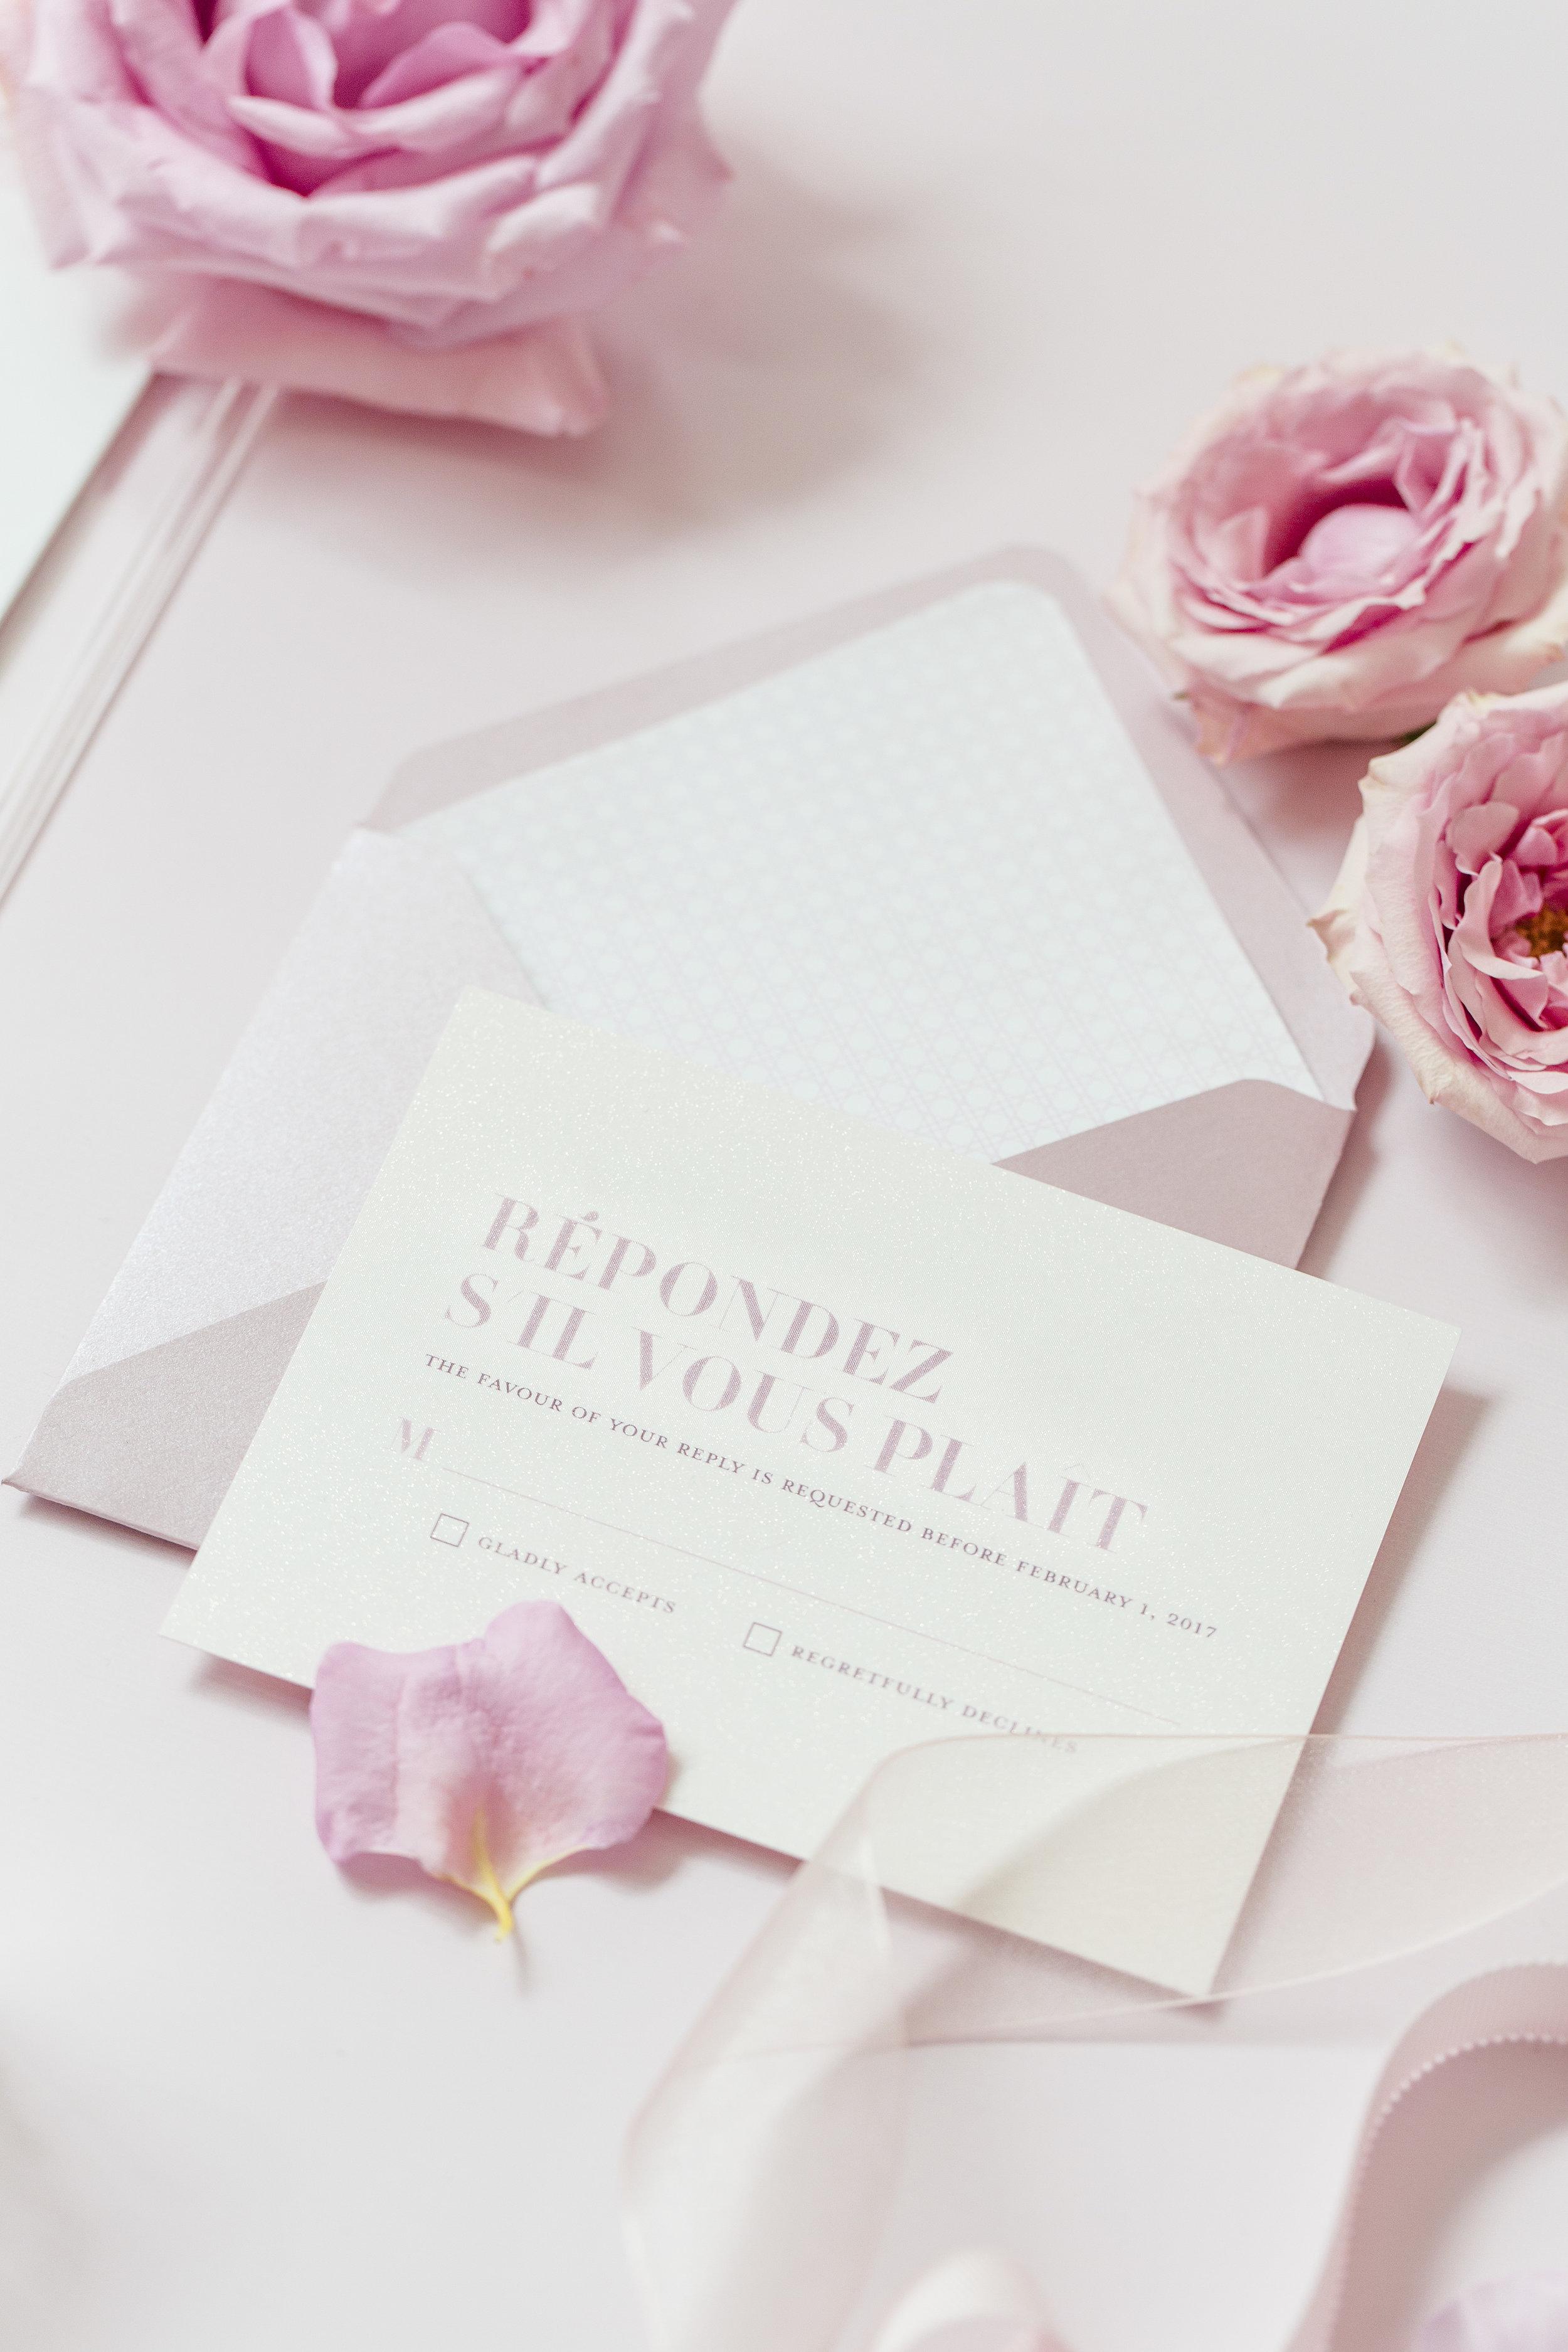 August In Bloom - Invitation Suite RSVP - Dior Darling (Wedluxe)